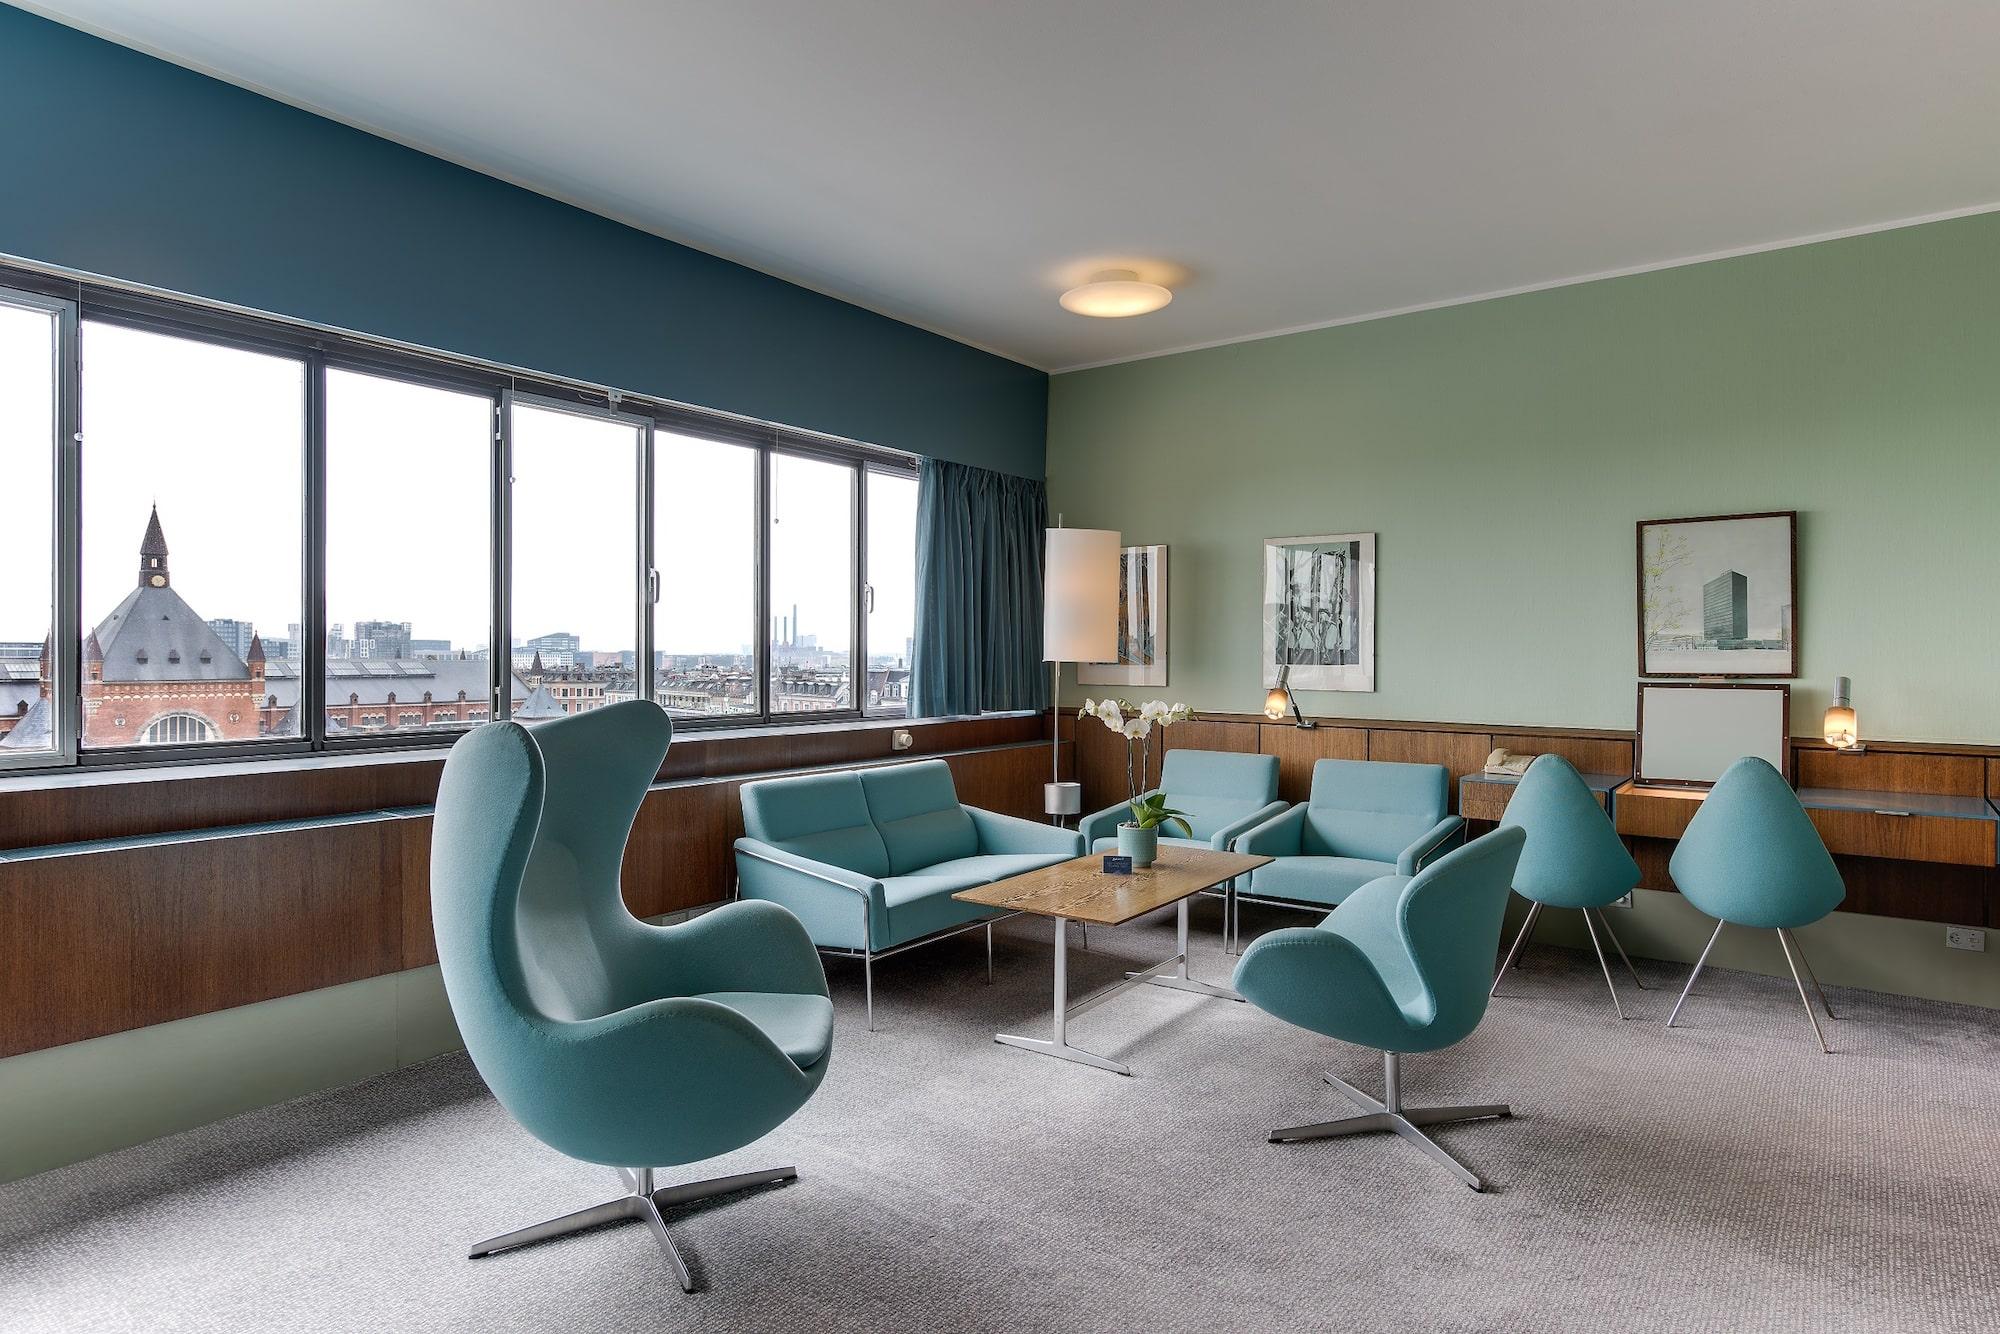 Room 606, the Arne Jacobsen Suite, at the Radisson Blu Royal Hotel in Copenhagen